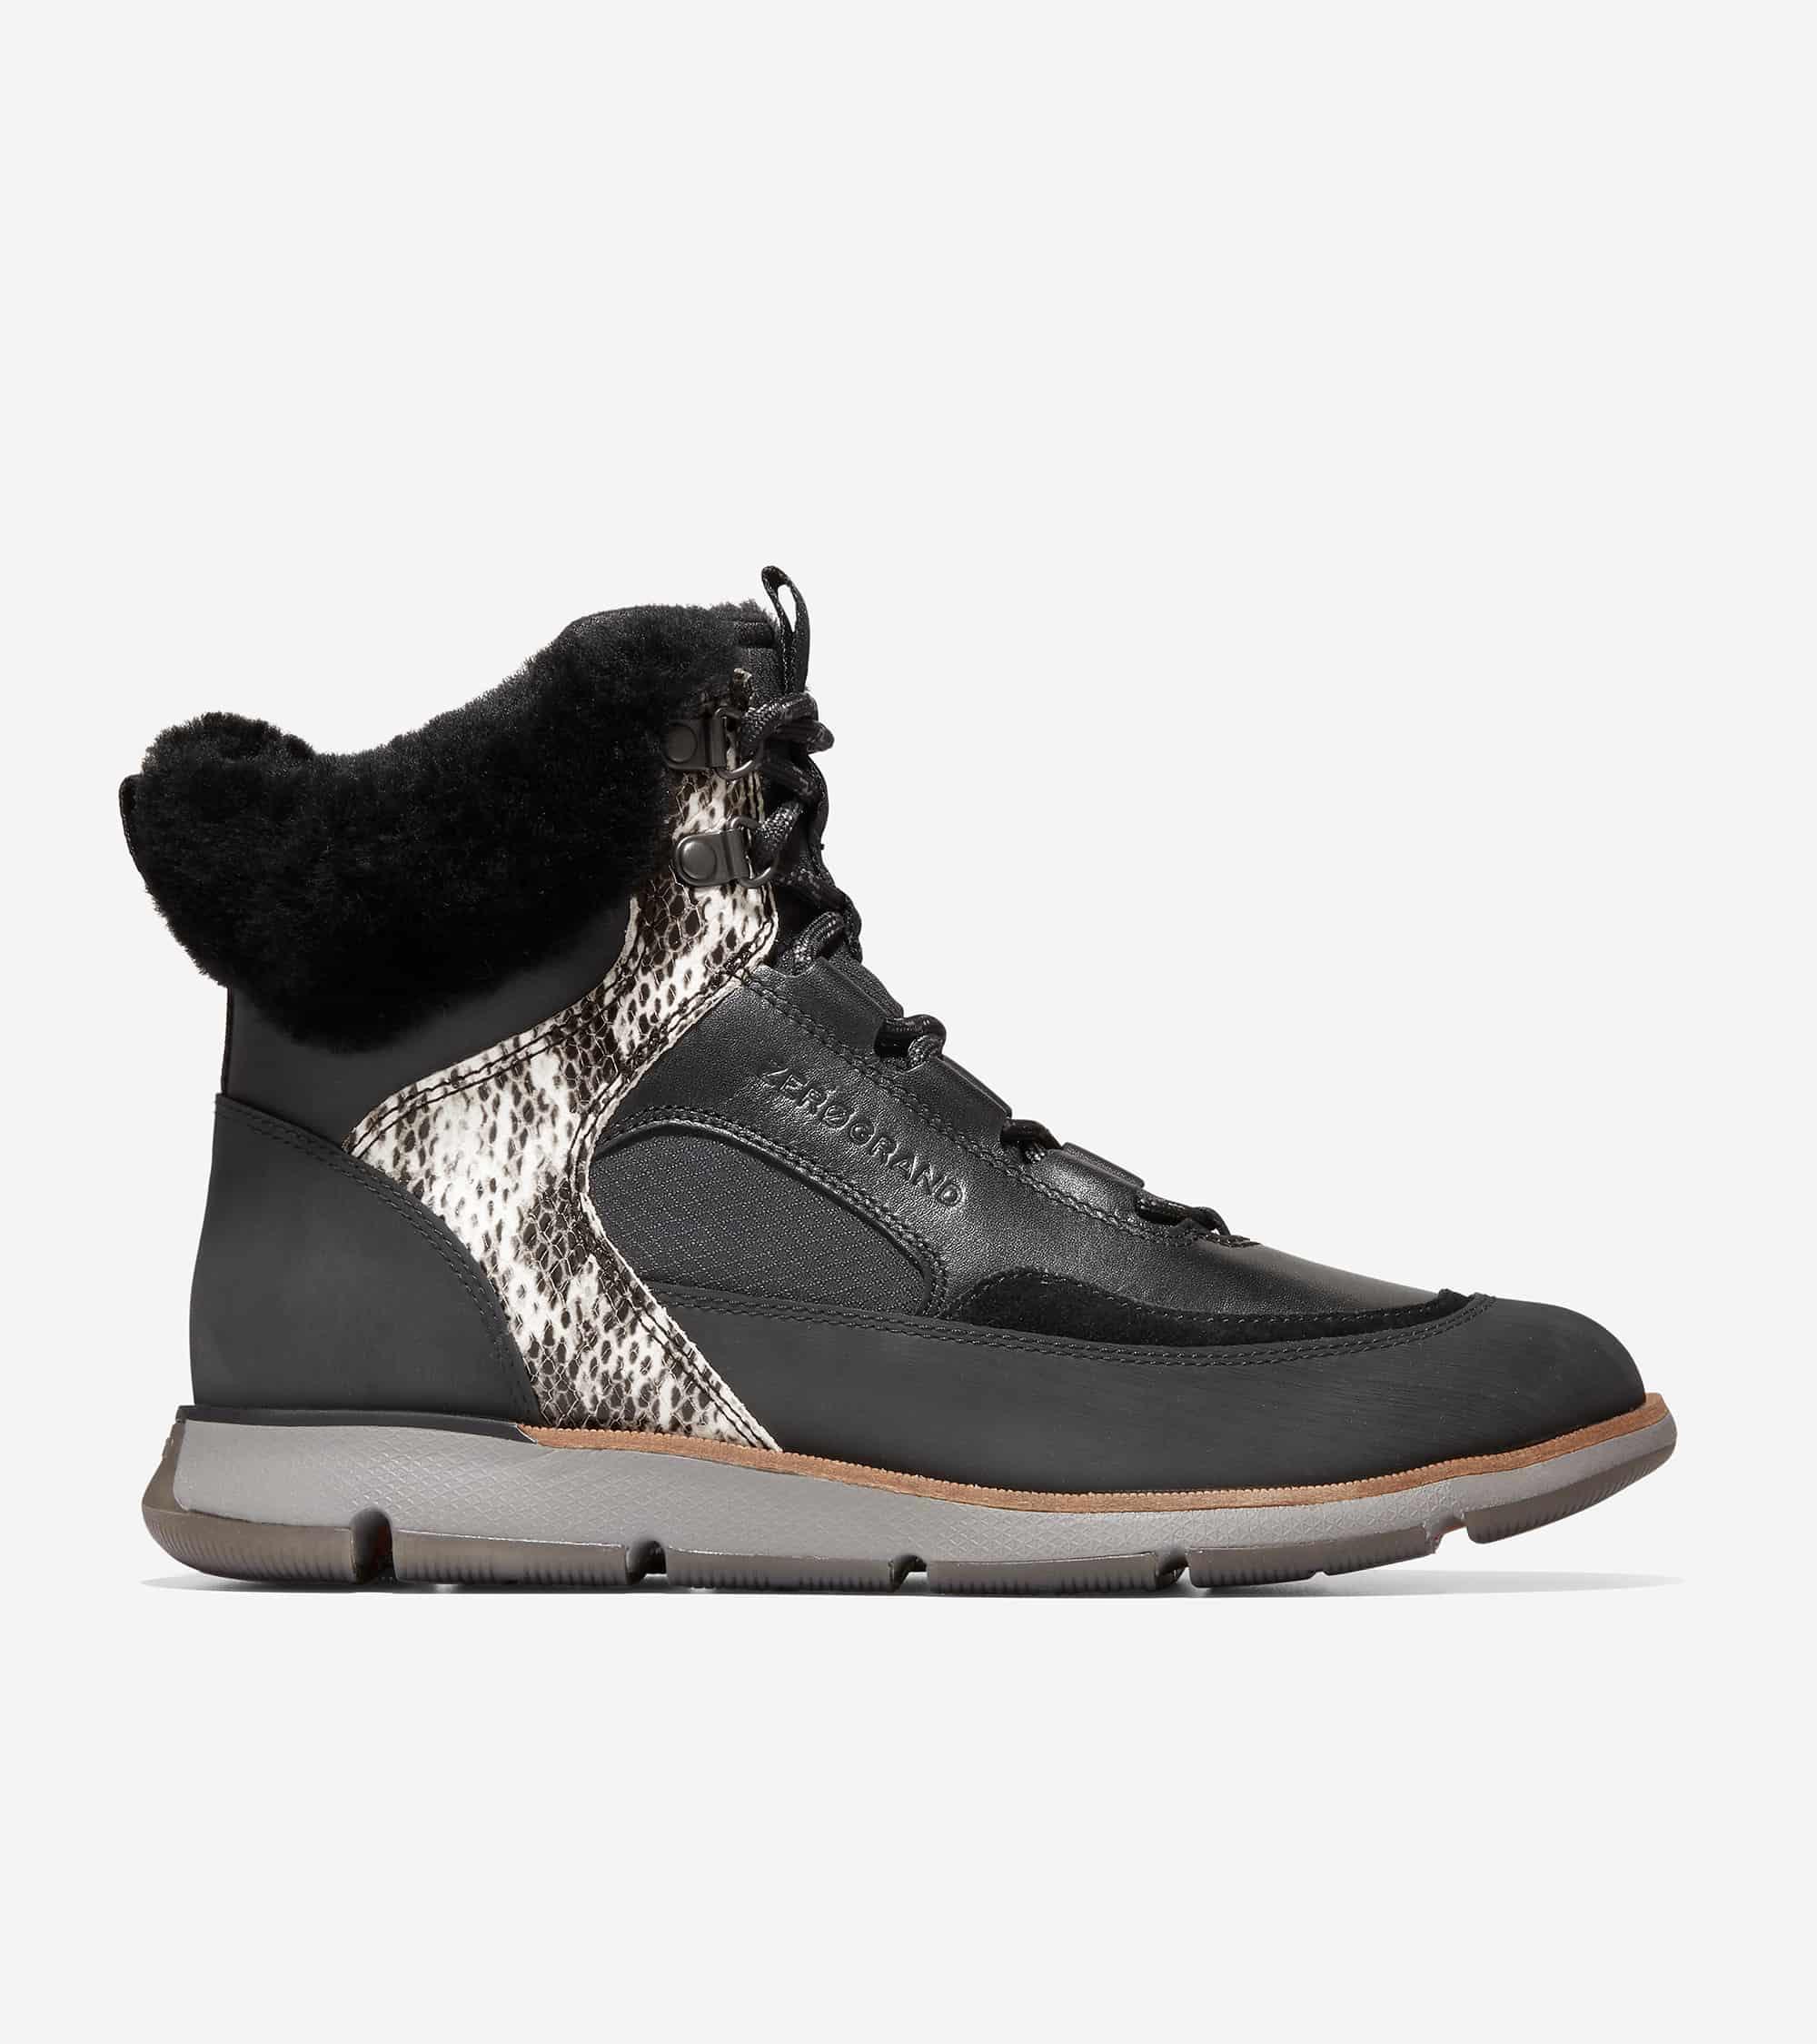 Cole Haan 4.ZERØGRAND Hiker Boot Black-Snake Print